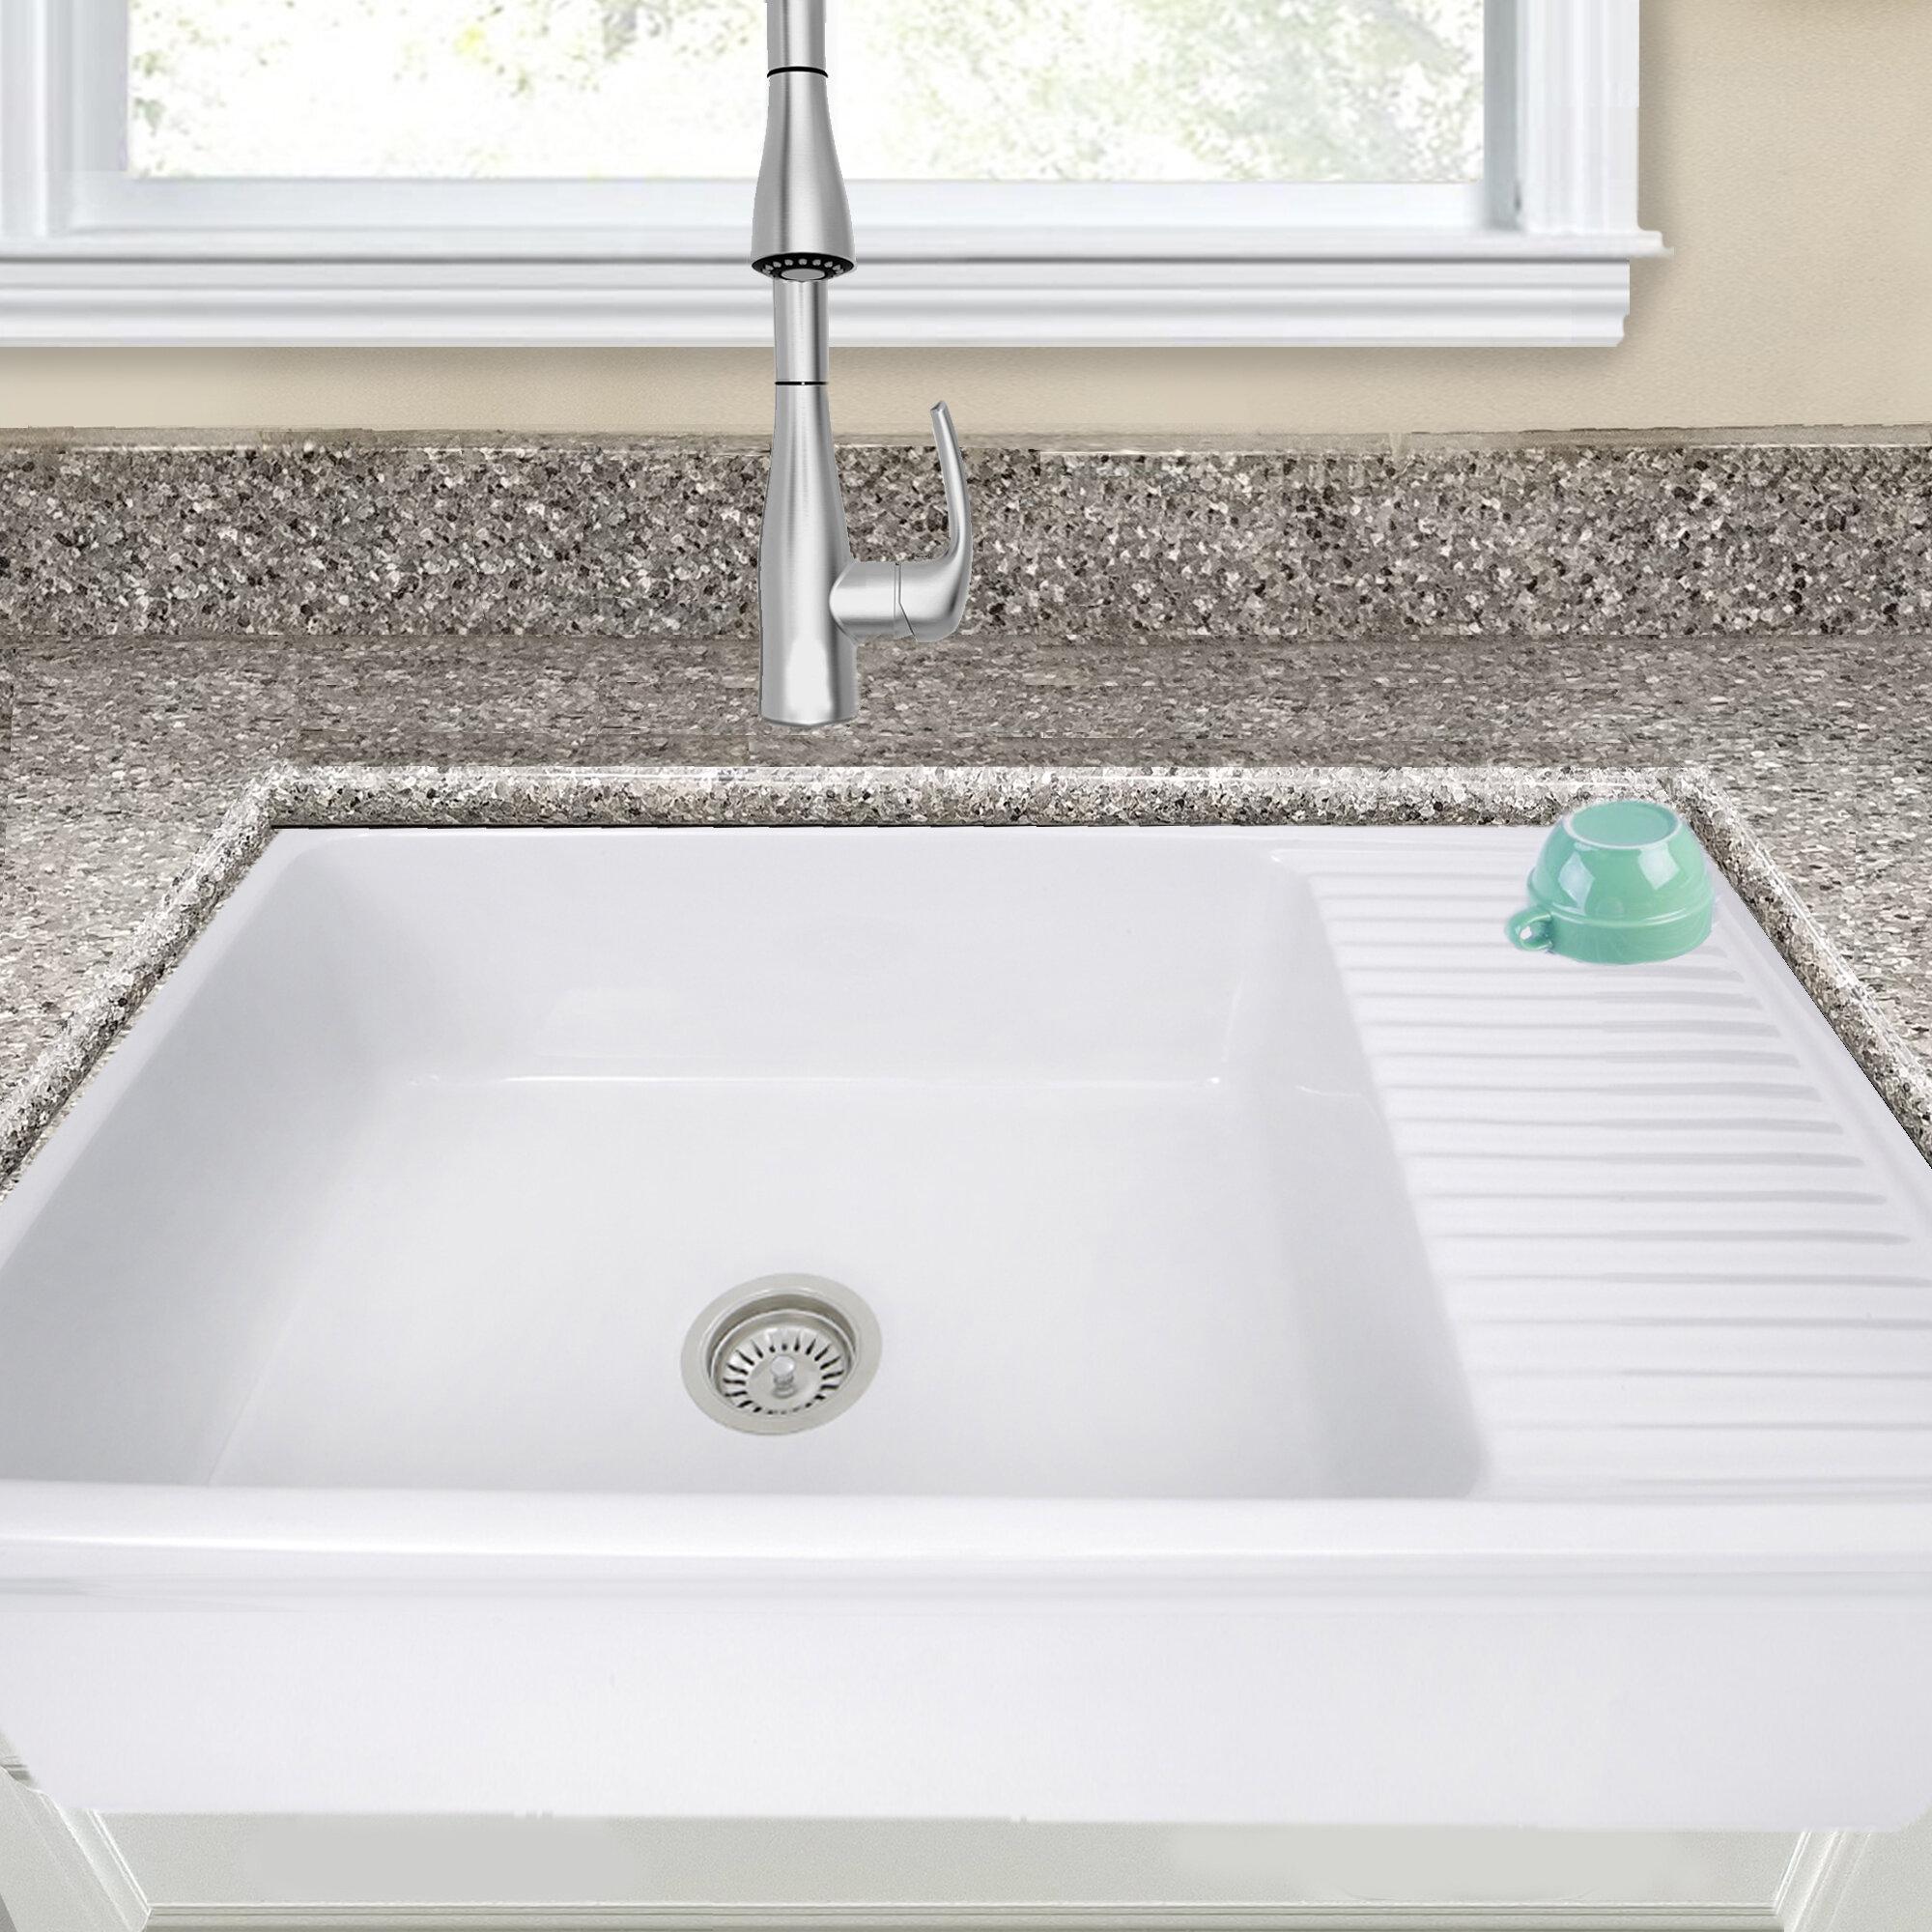 Farmhouse Kitchen Sink With Drainboard 42Nantucket Sinks Cape ...